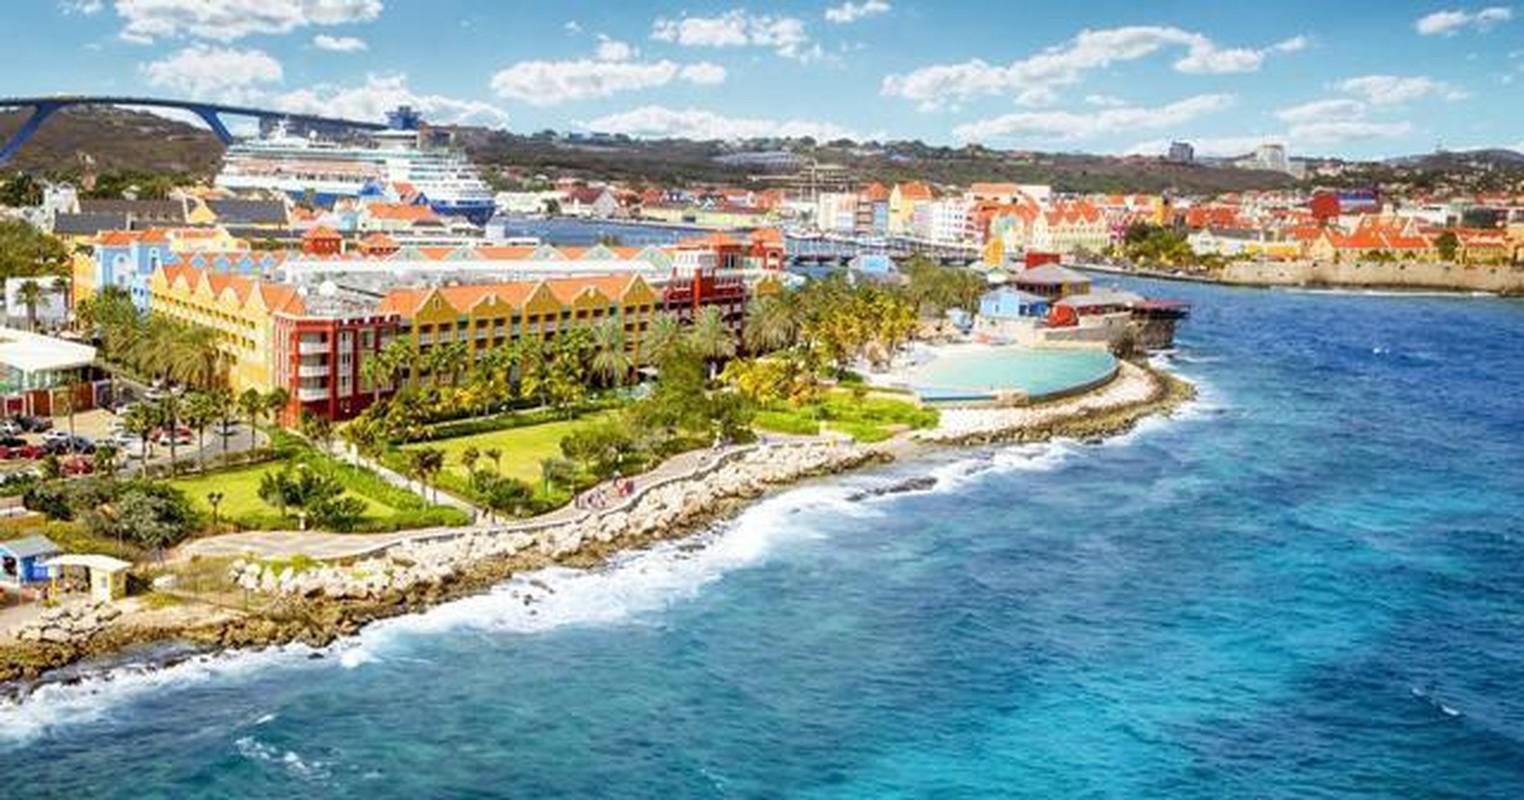 Curacao - Doi thu cua Viet Nam tai King's Cup: Giau khung co nao?-Hinh-3